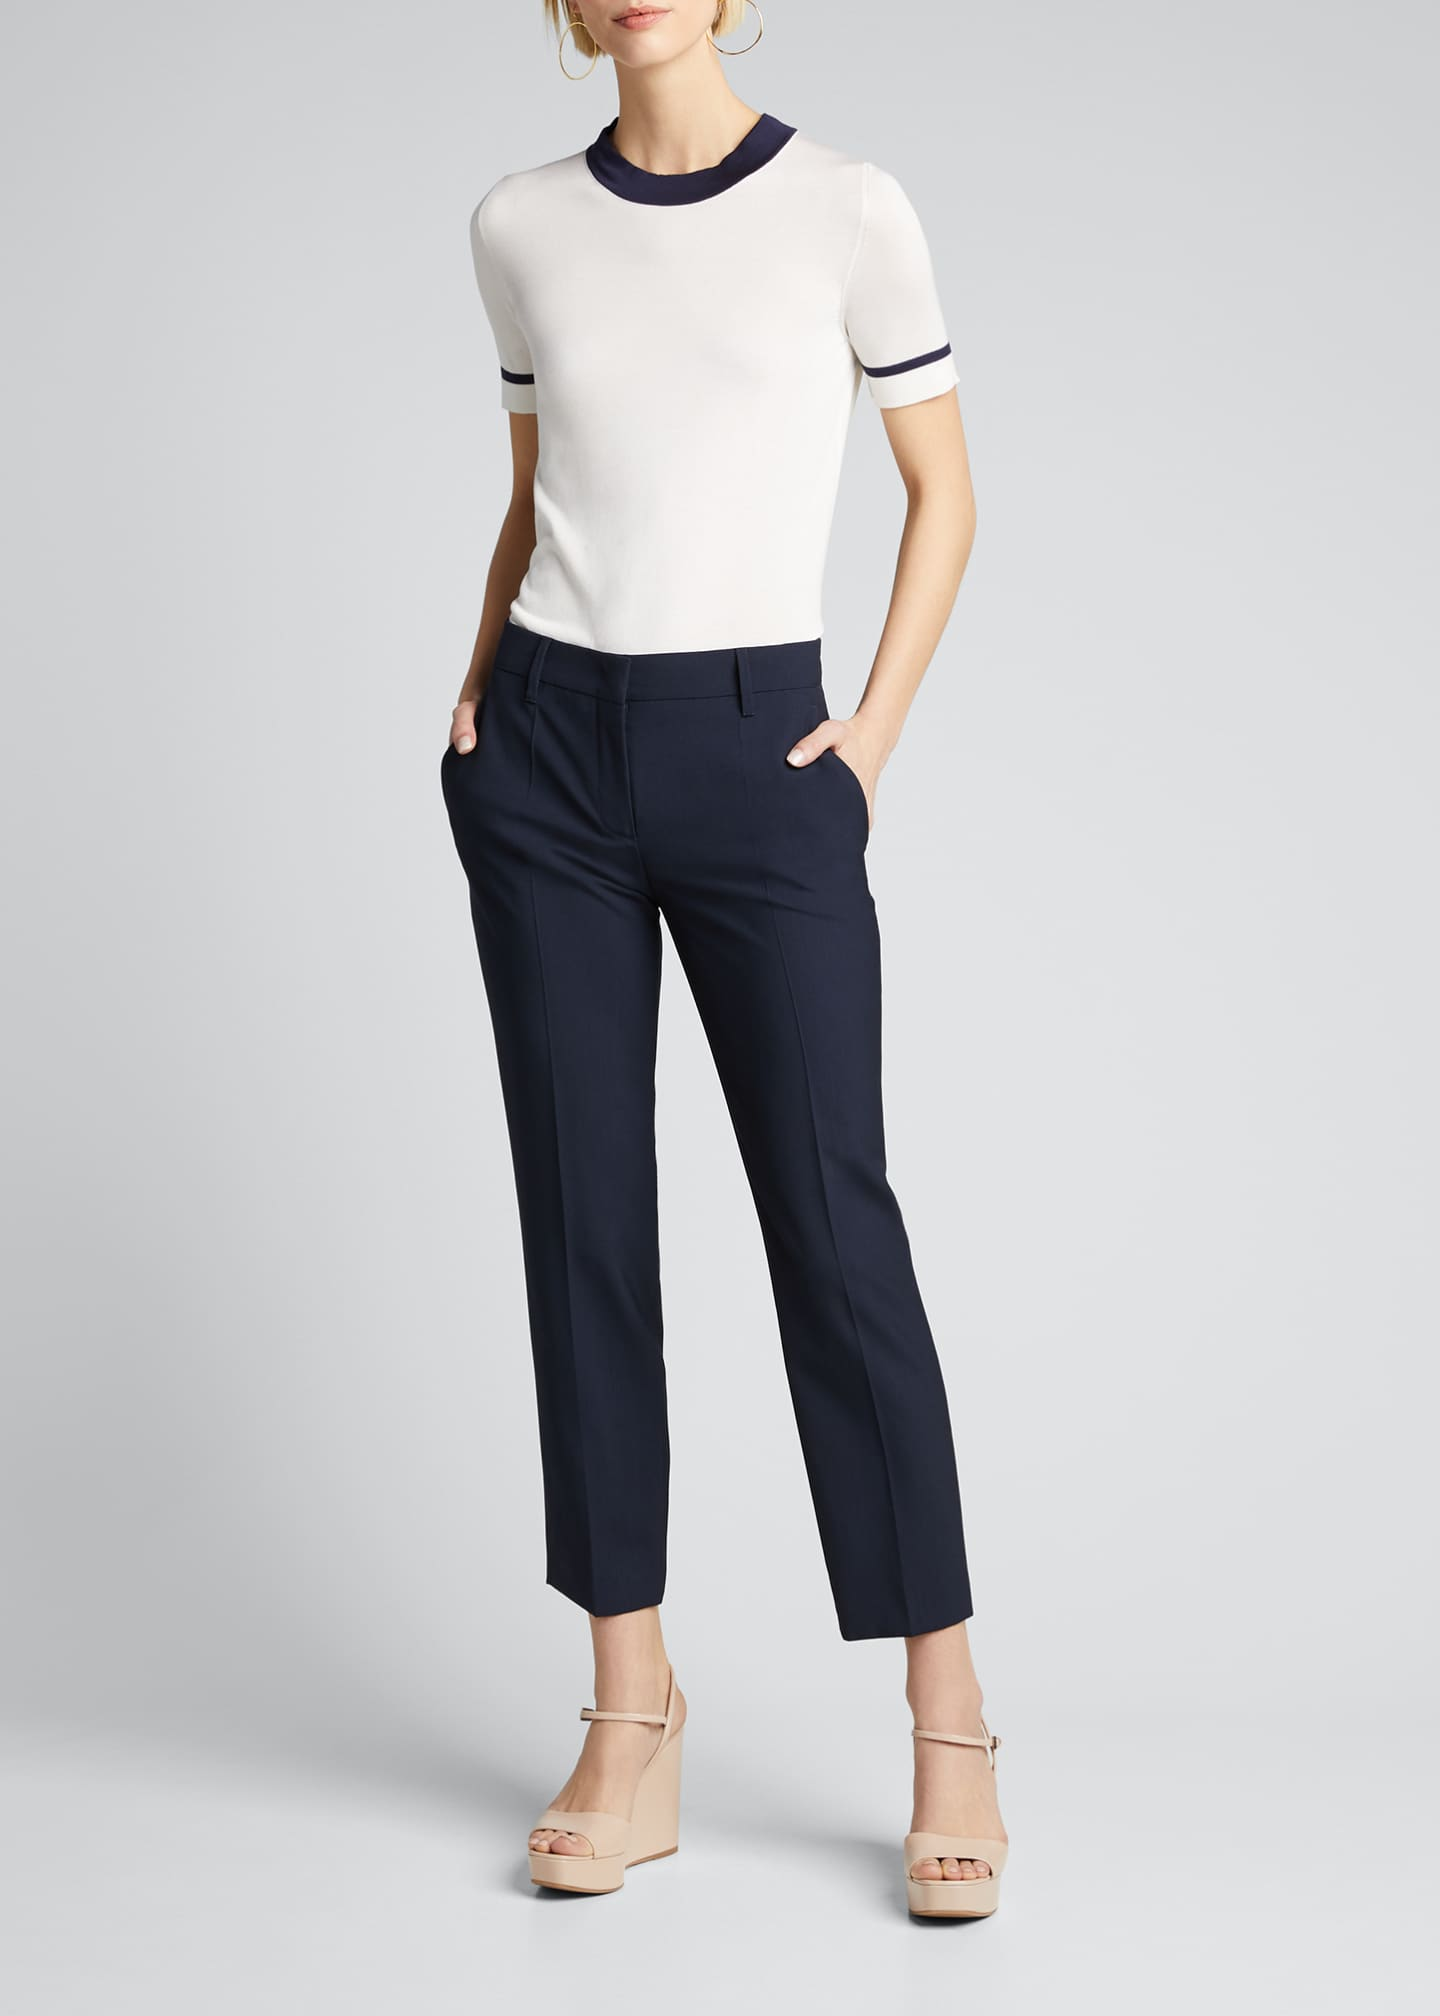 Prada Lightweight Silk Short-Sleeve Sweater